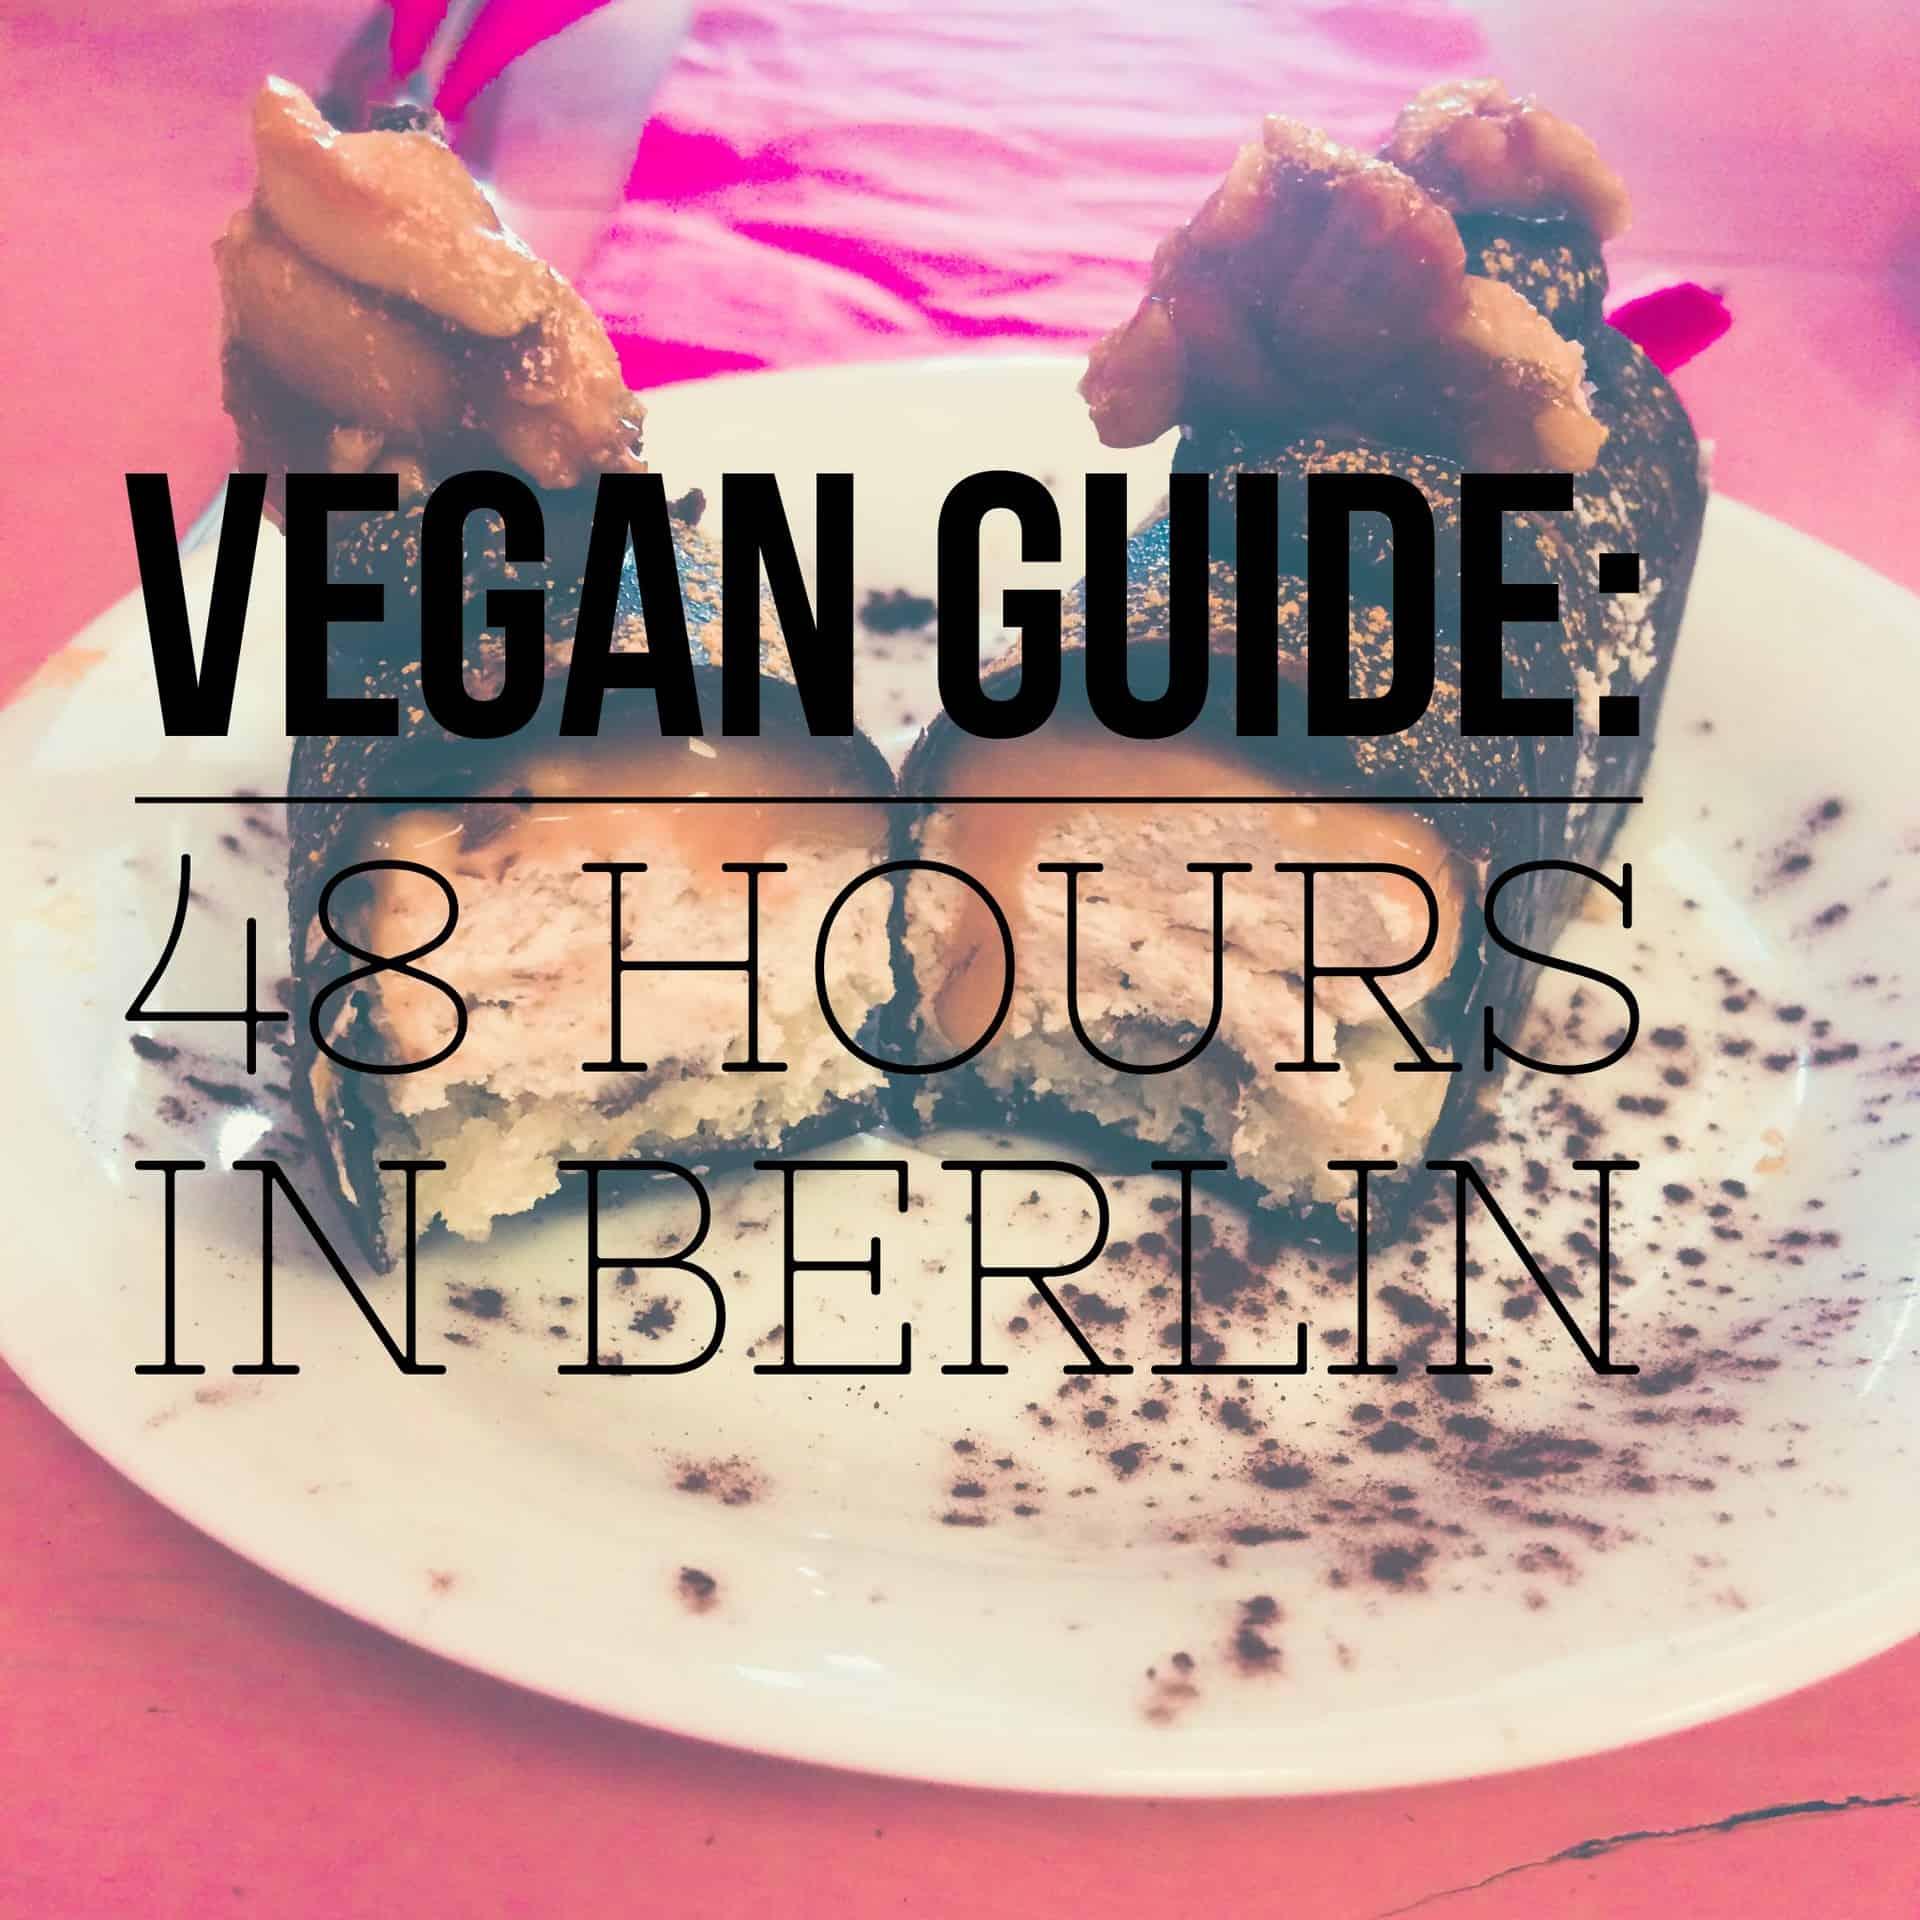 Vegan Guide: 48 Hours in Berlin